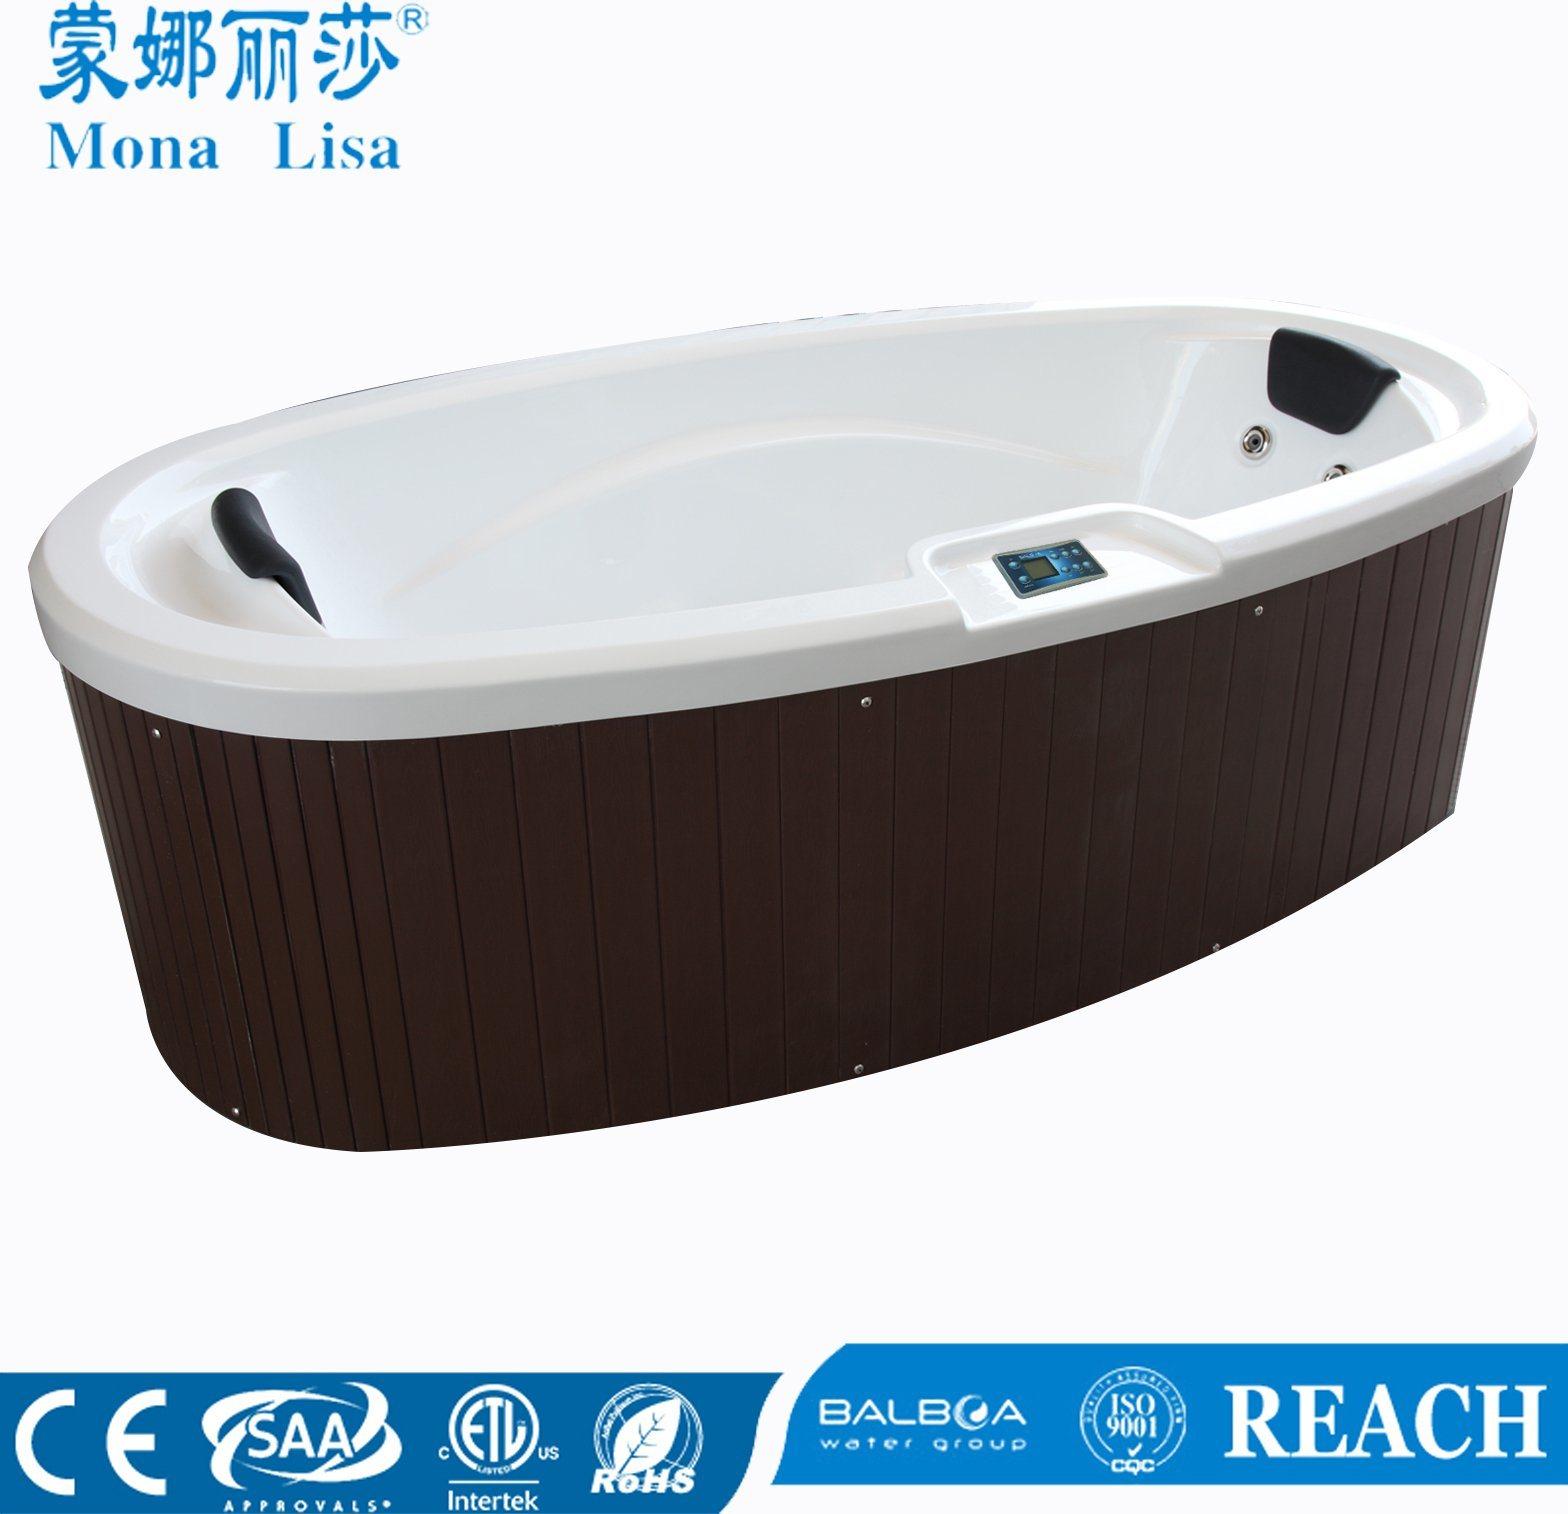 China Portable Outdoor Hot Tub Whirlpool SPA (M-3360) - China 4 ...